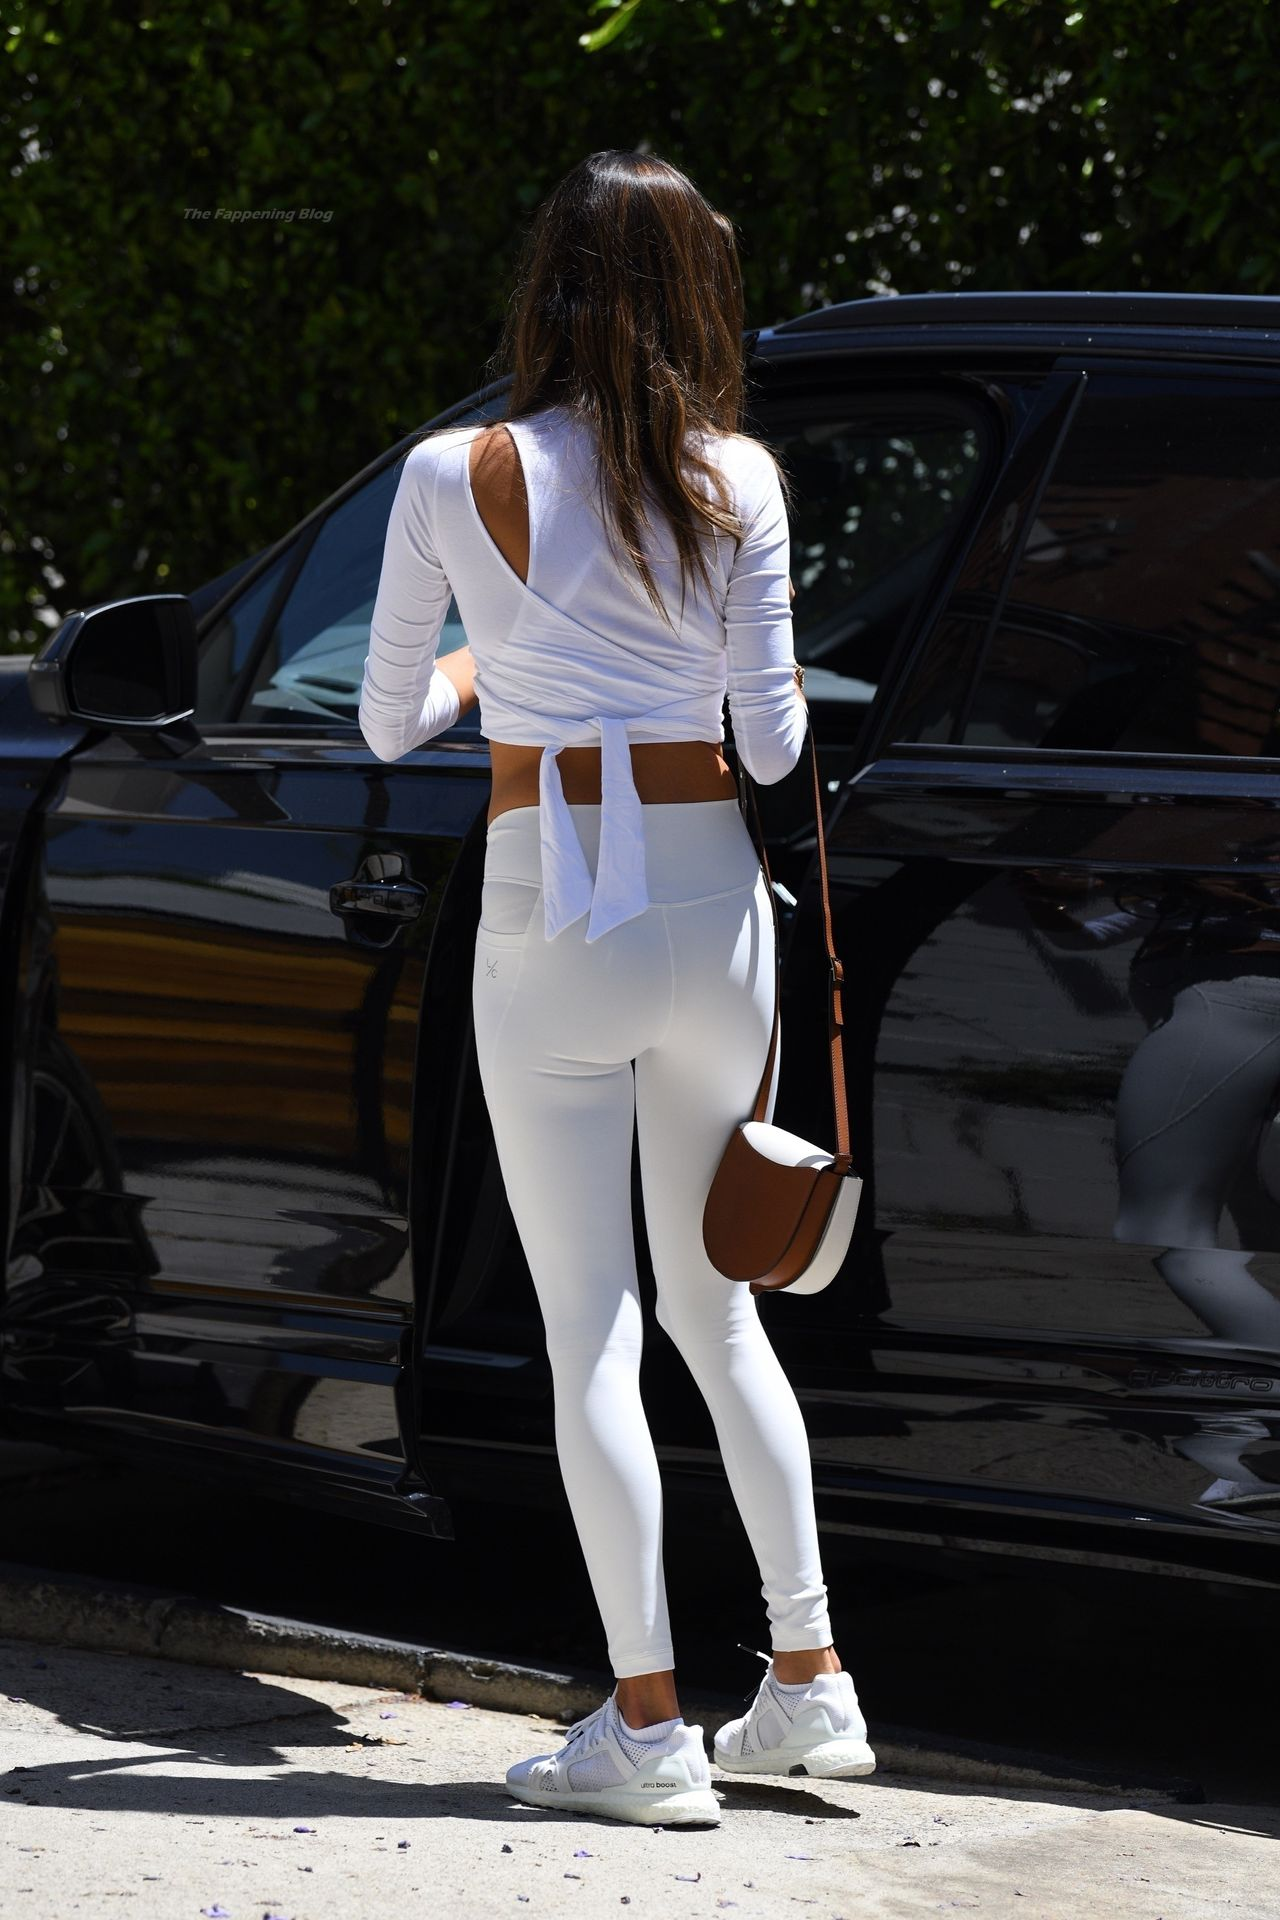 Alessandra-Ambrosio-Sexy-77-leakedmodels.com_.jpg